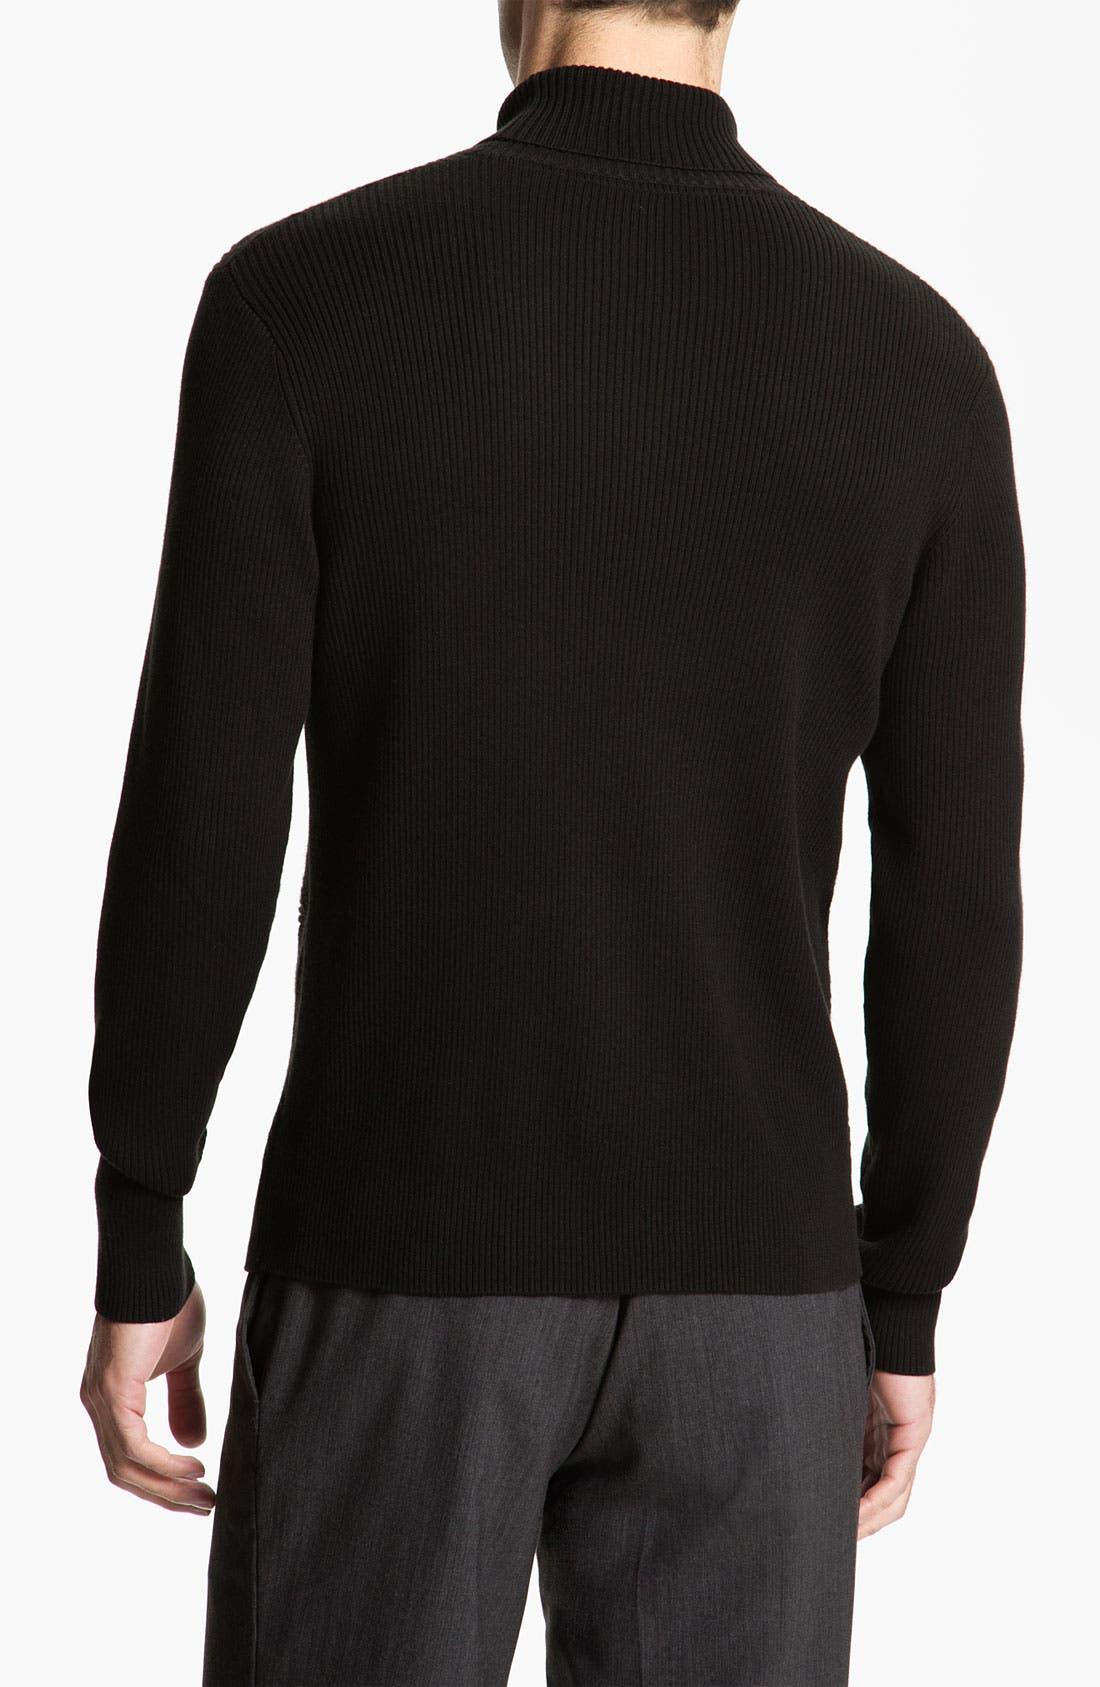 Alternate Image 2  - Calibrate Cross Ribbed Cotton & Cashmere Turtleneck Sweater